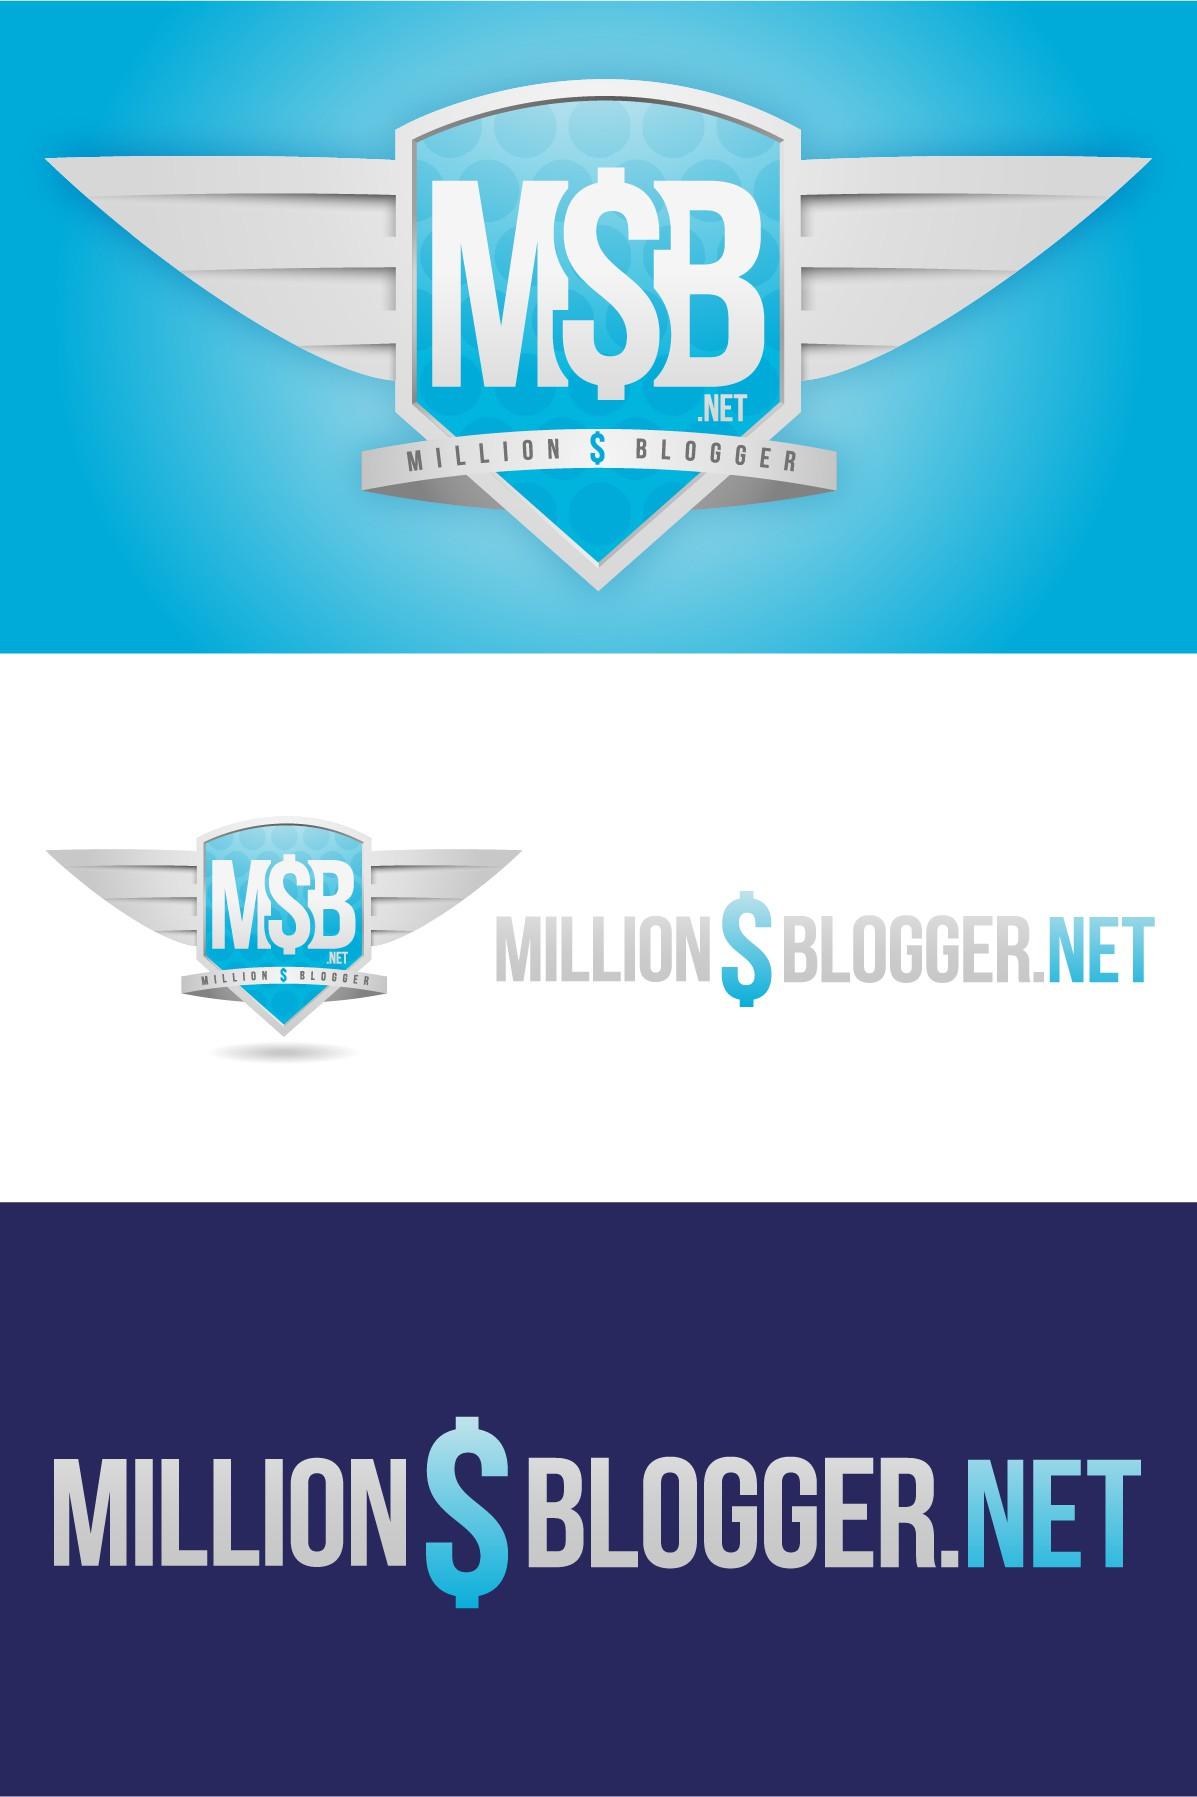 New logo wanted for MillionDollarBlogger.Net